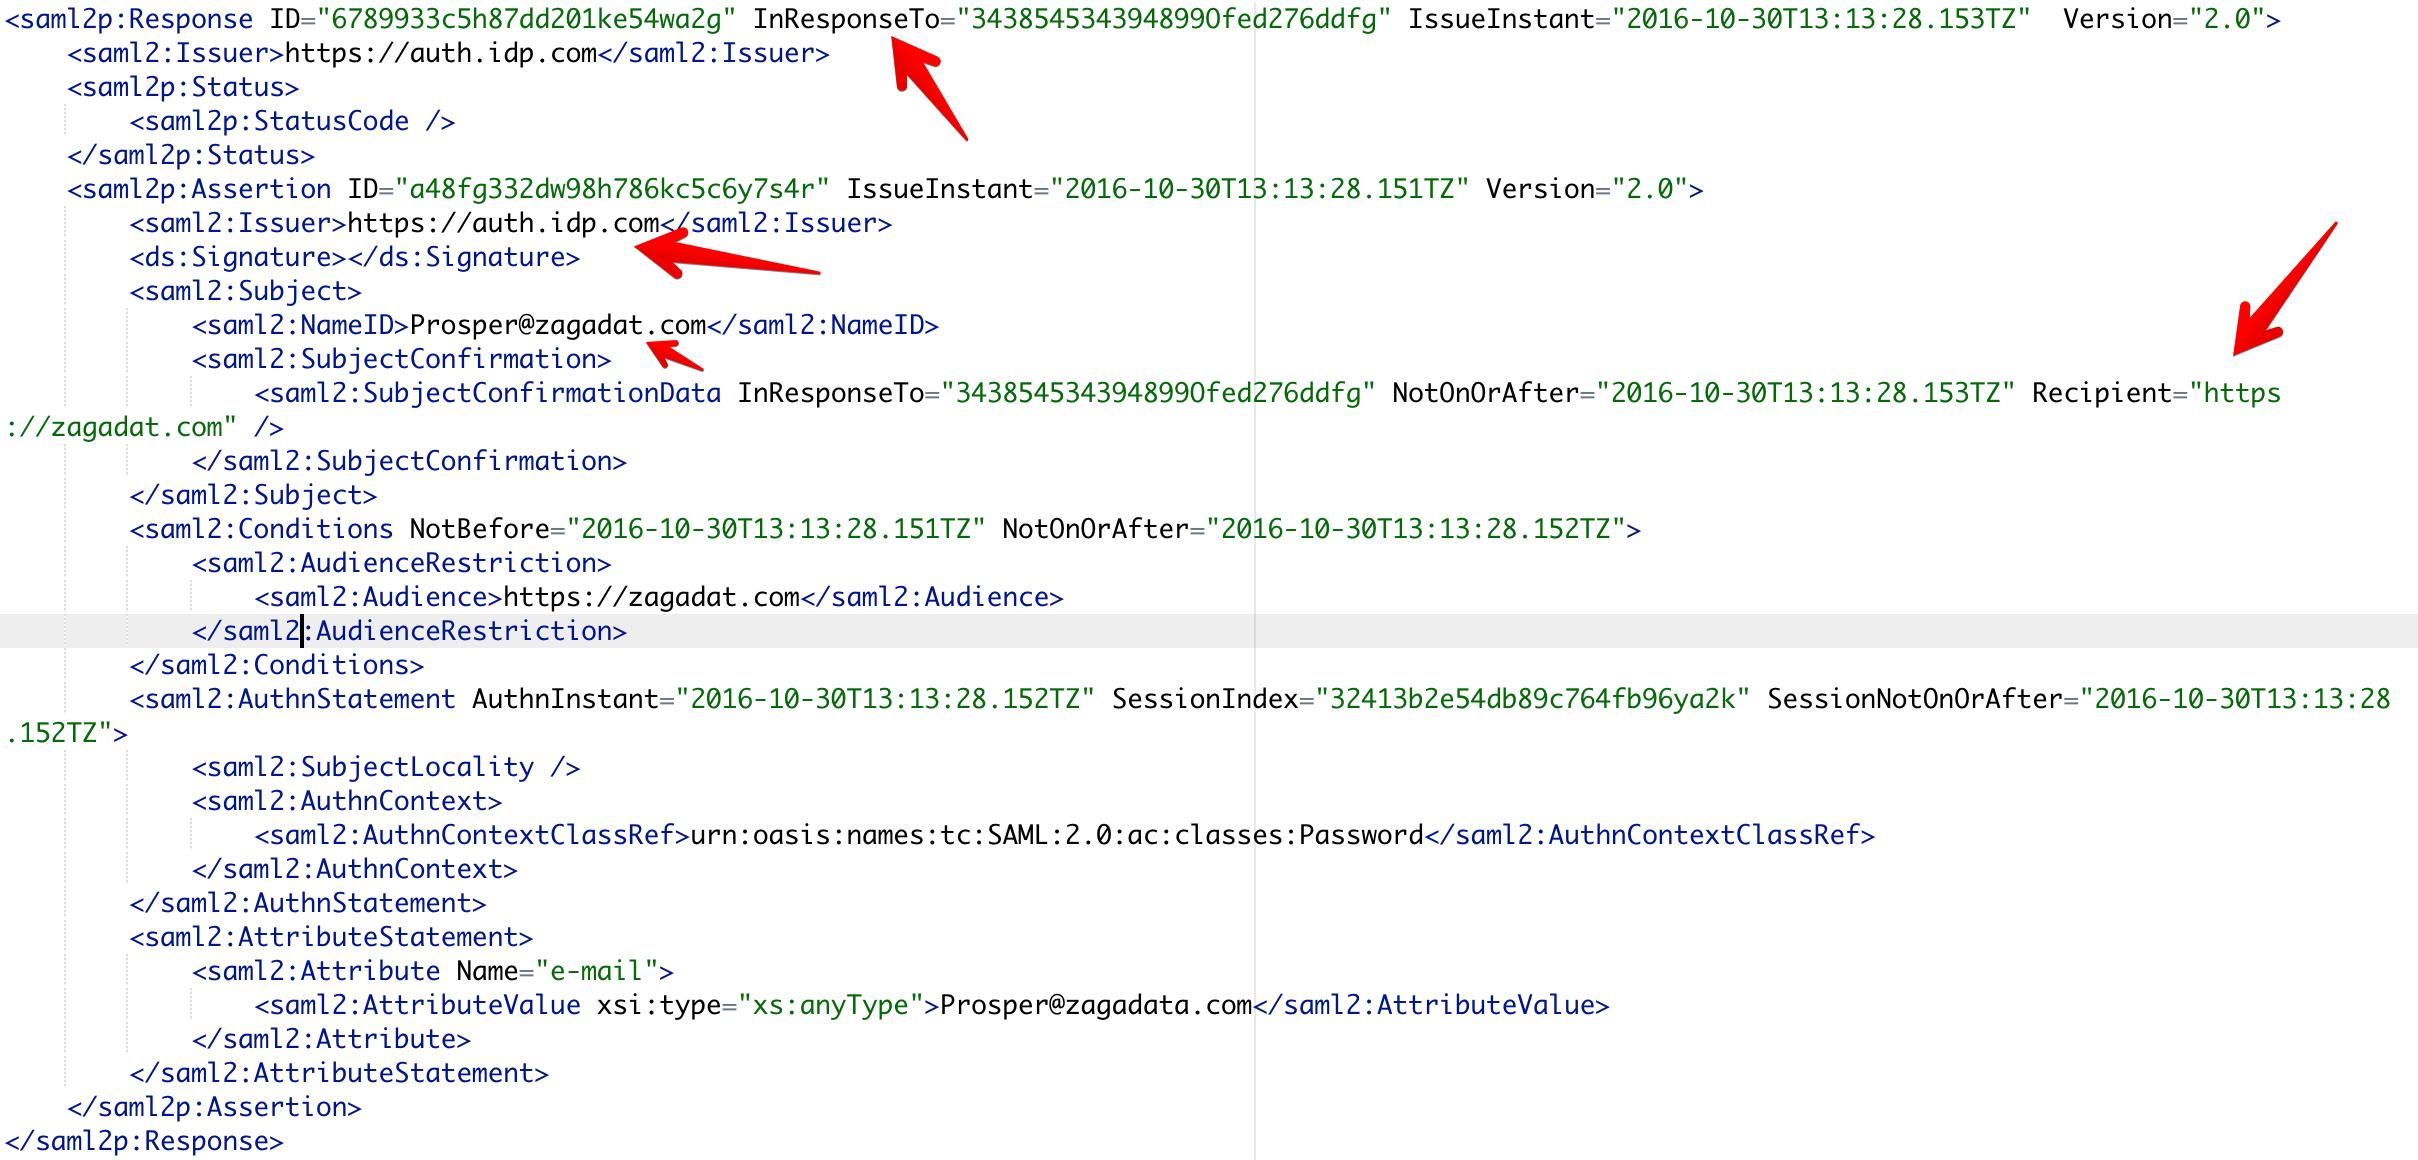 Typical SAML Authentication response